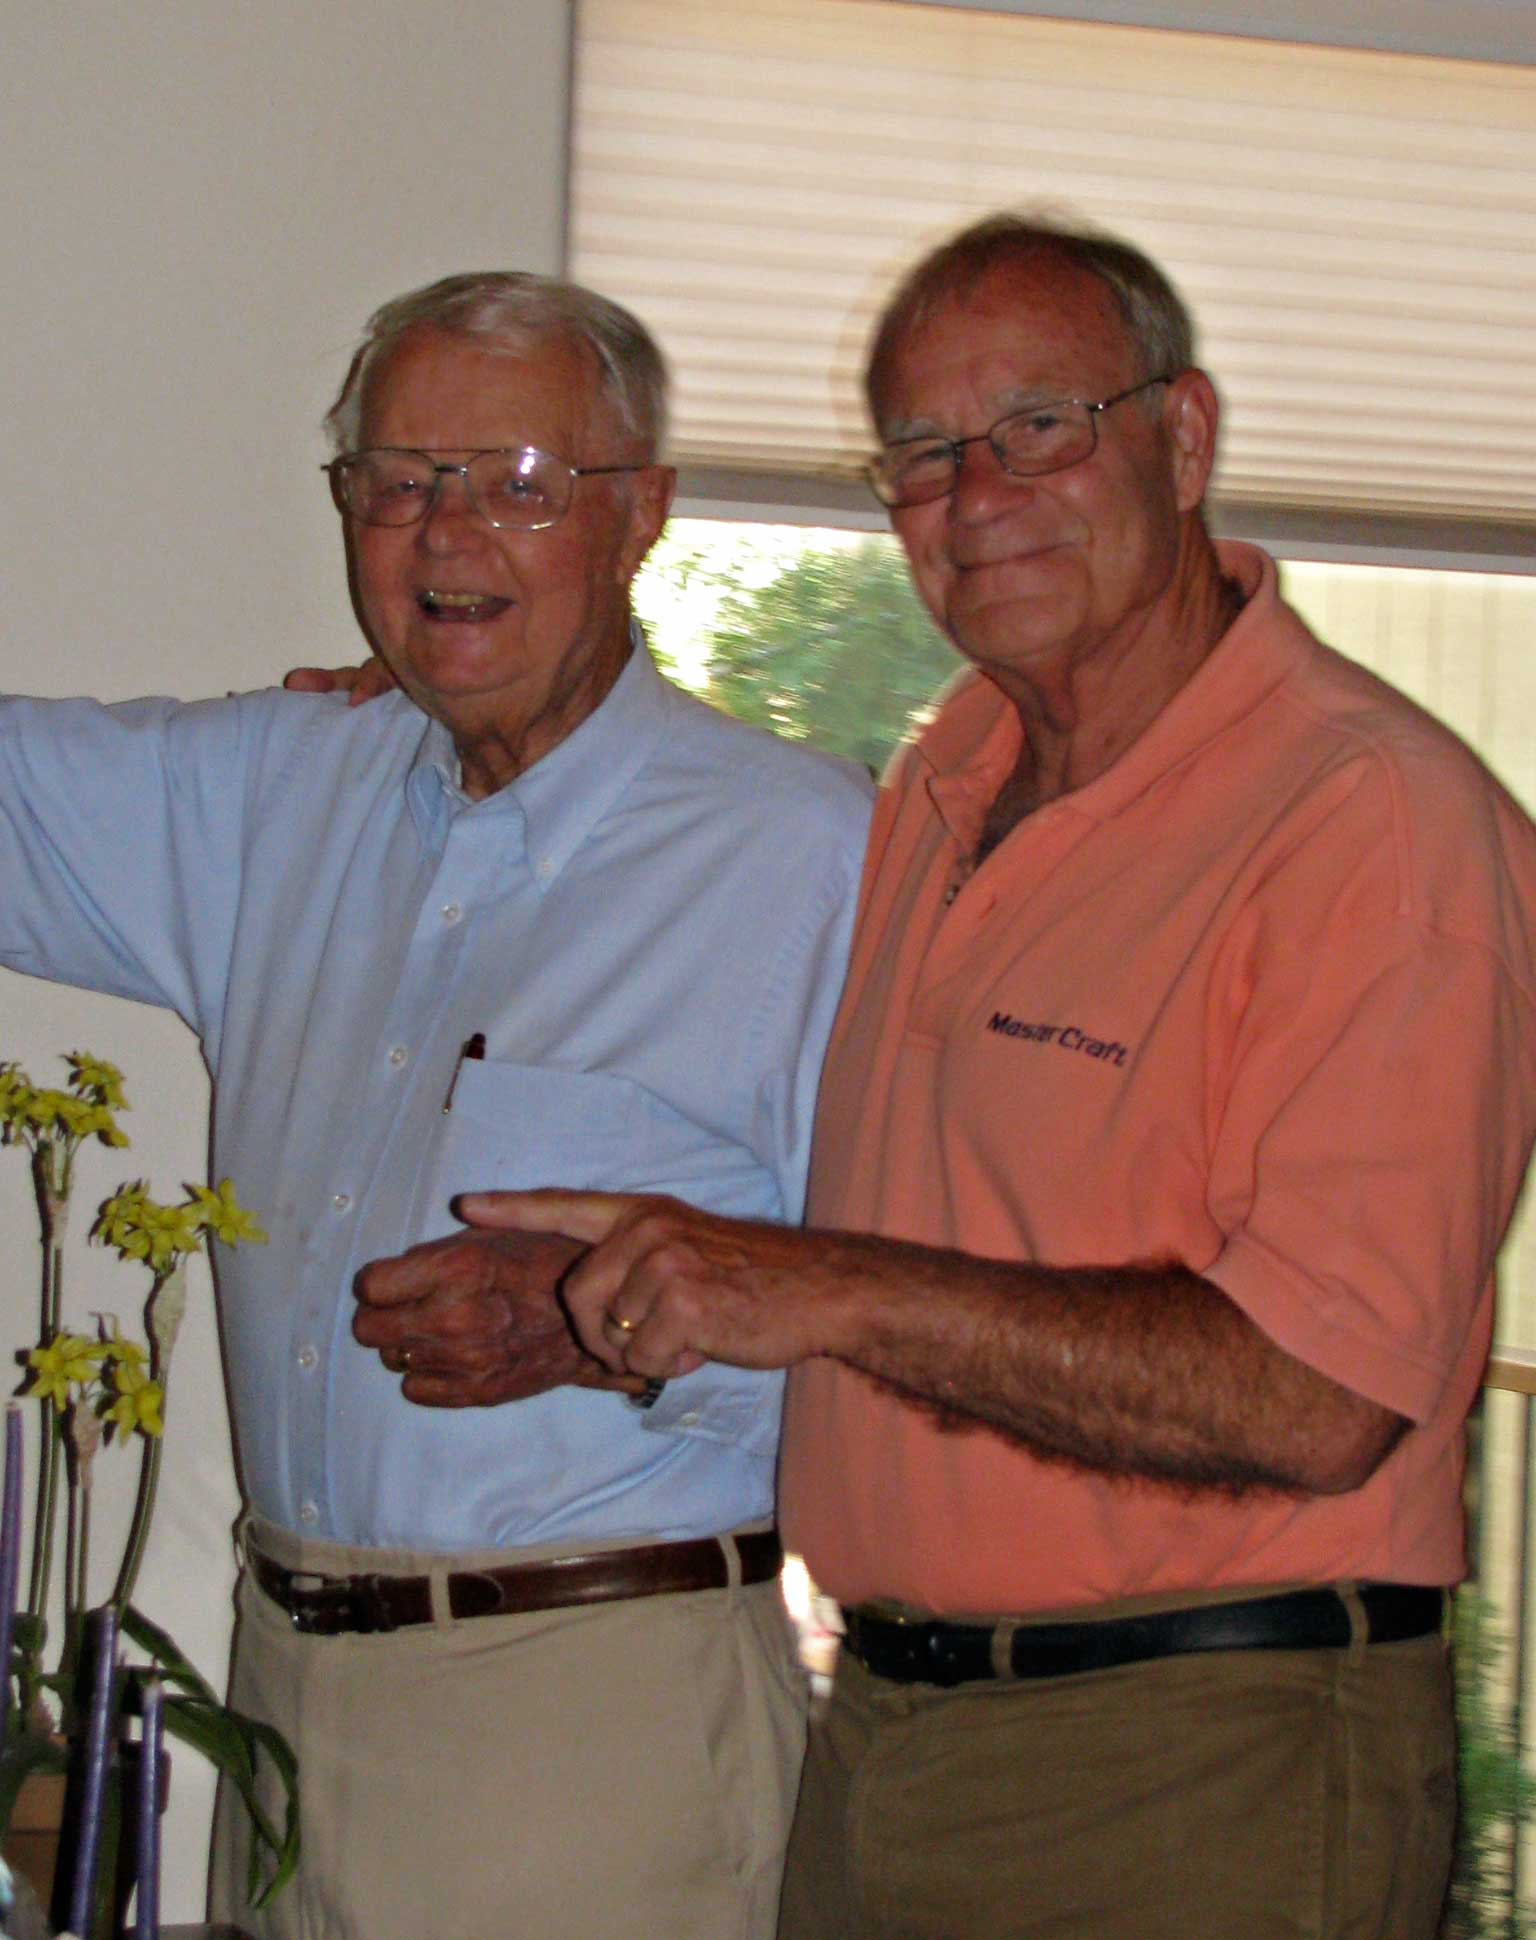 Jerry with Glenn Nordskog